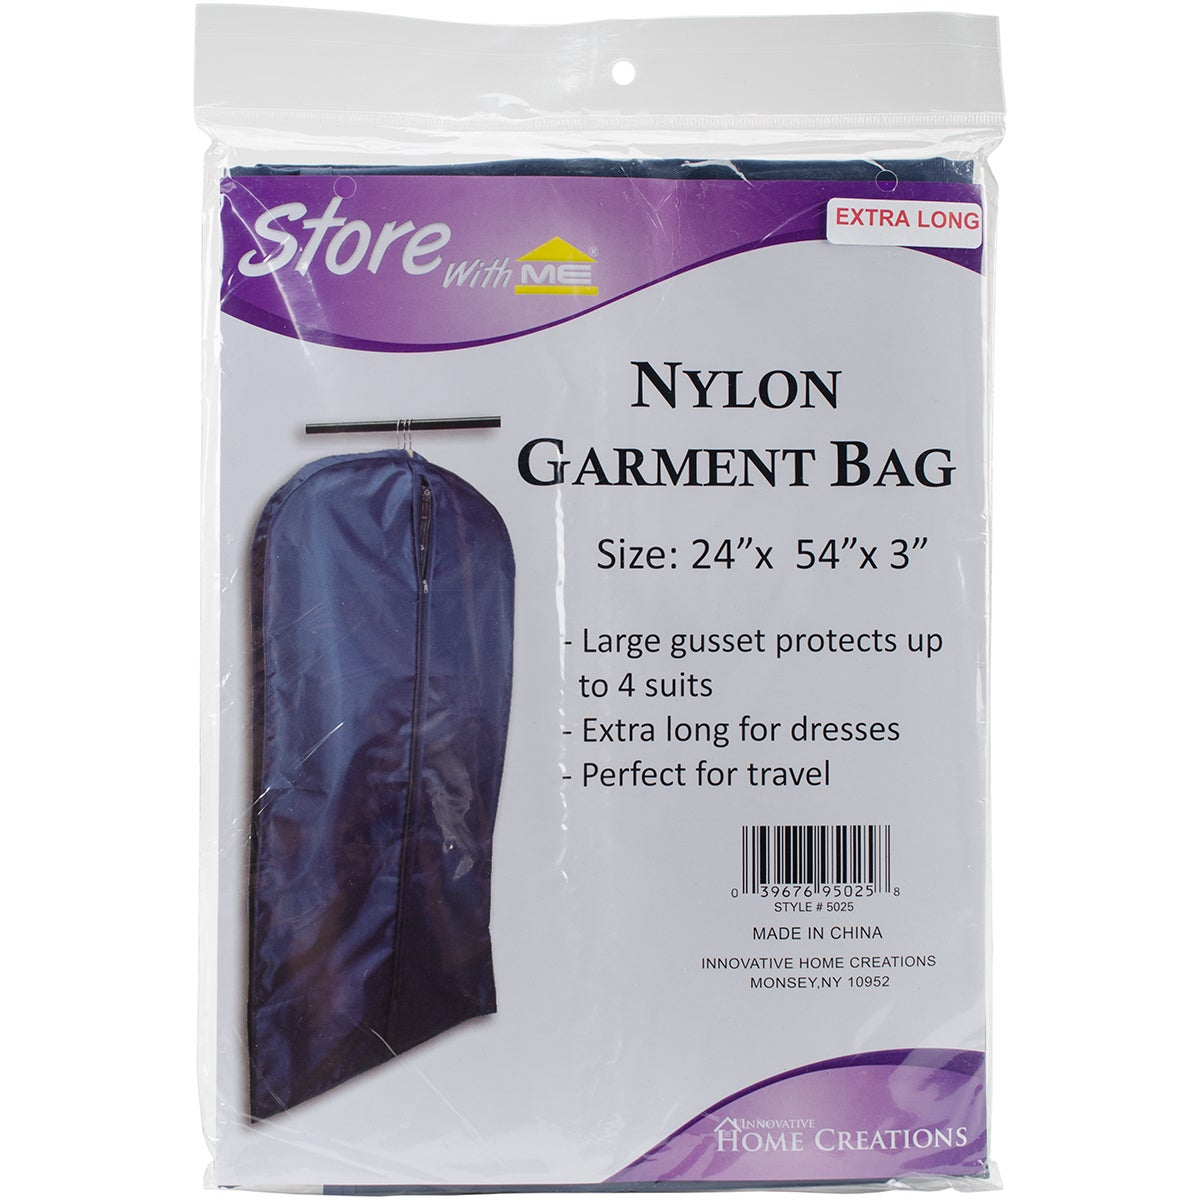 Innovative Home Creations Nylon Garment Bag-Black (Black)